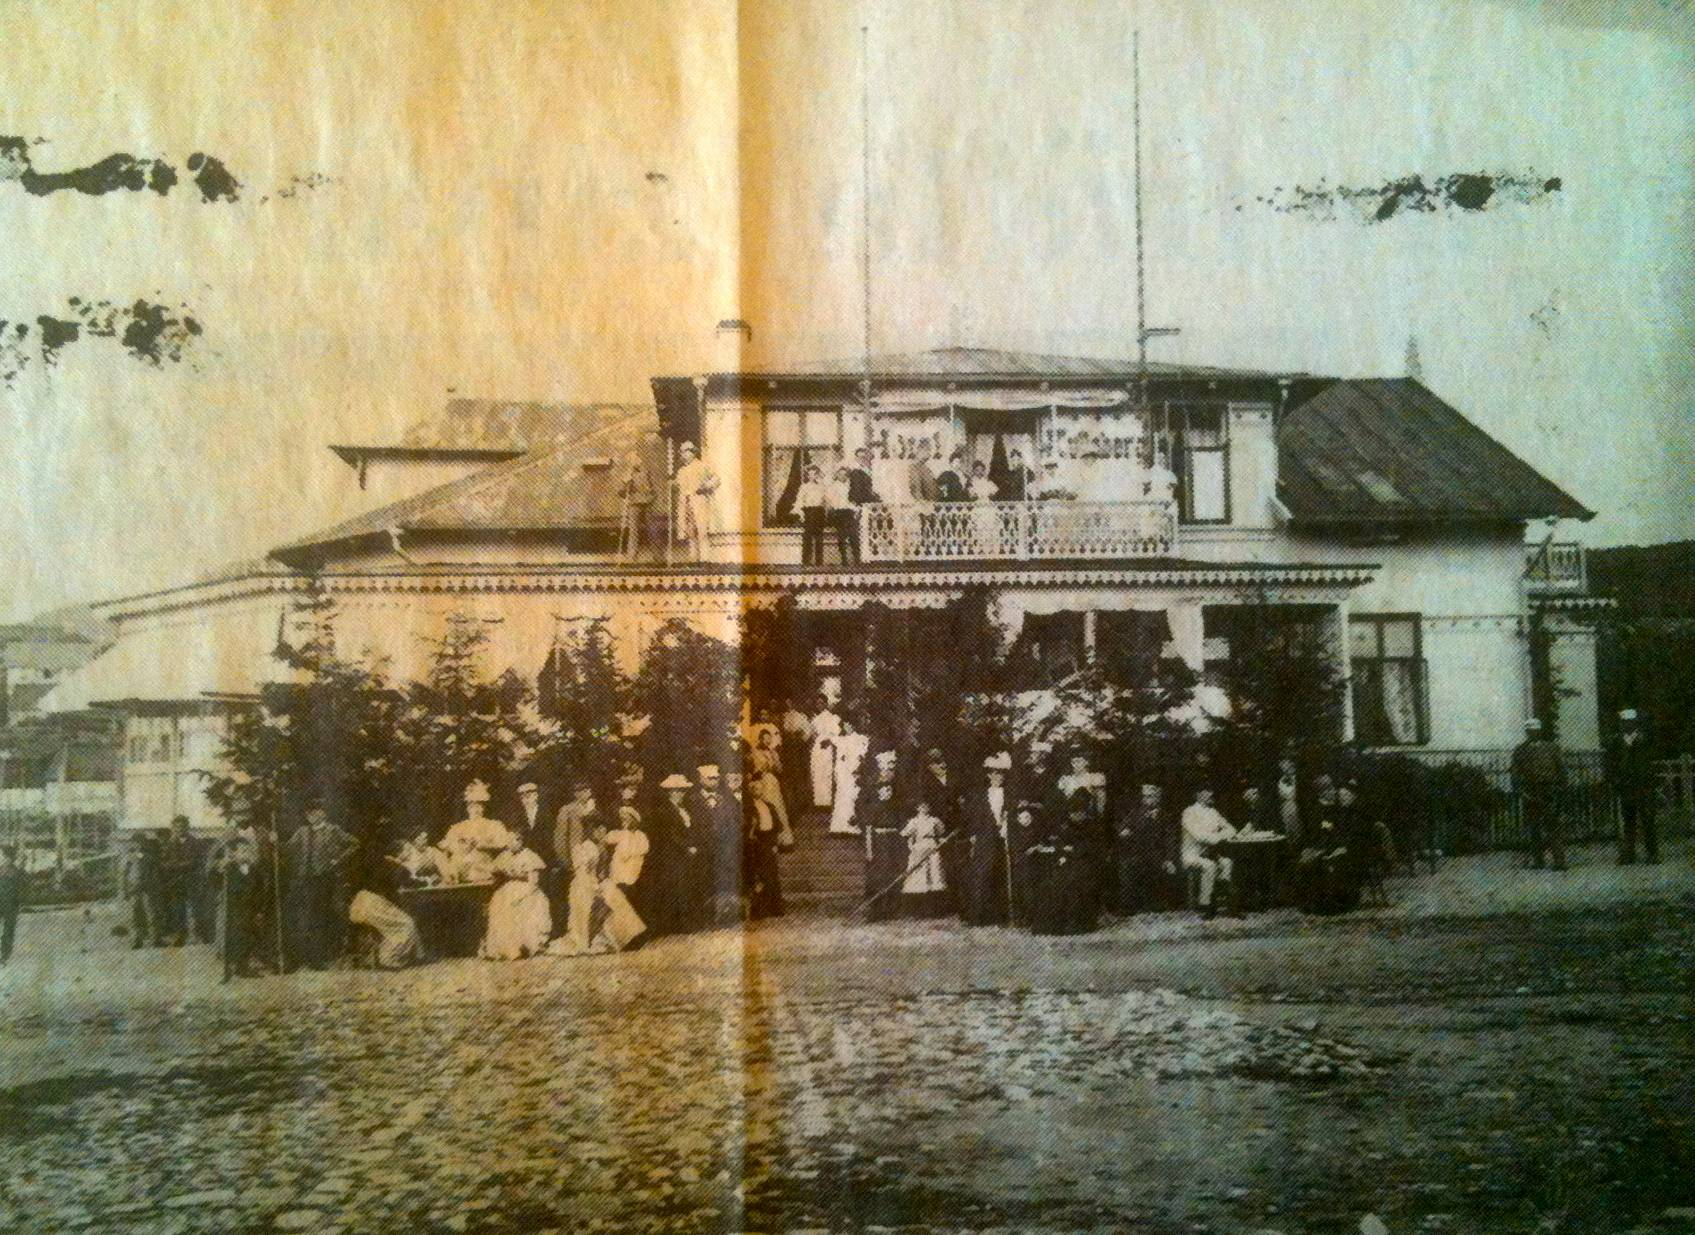 Hotell Kullaberg 1895